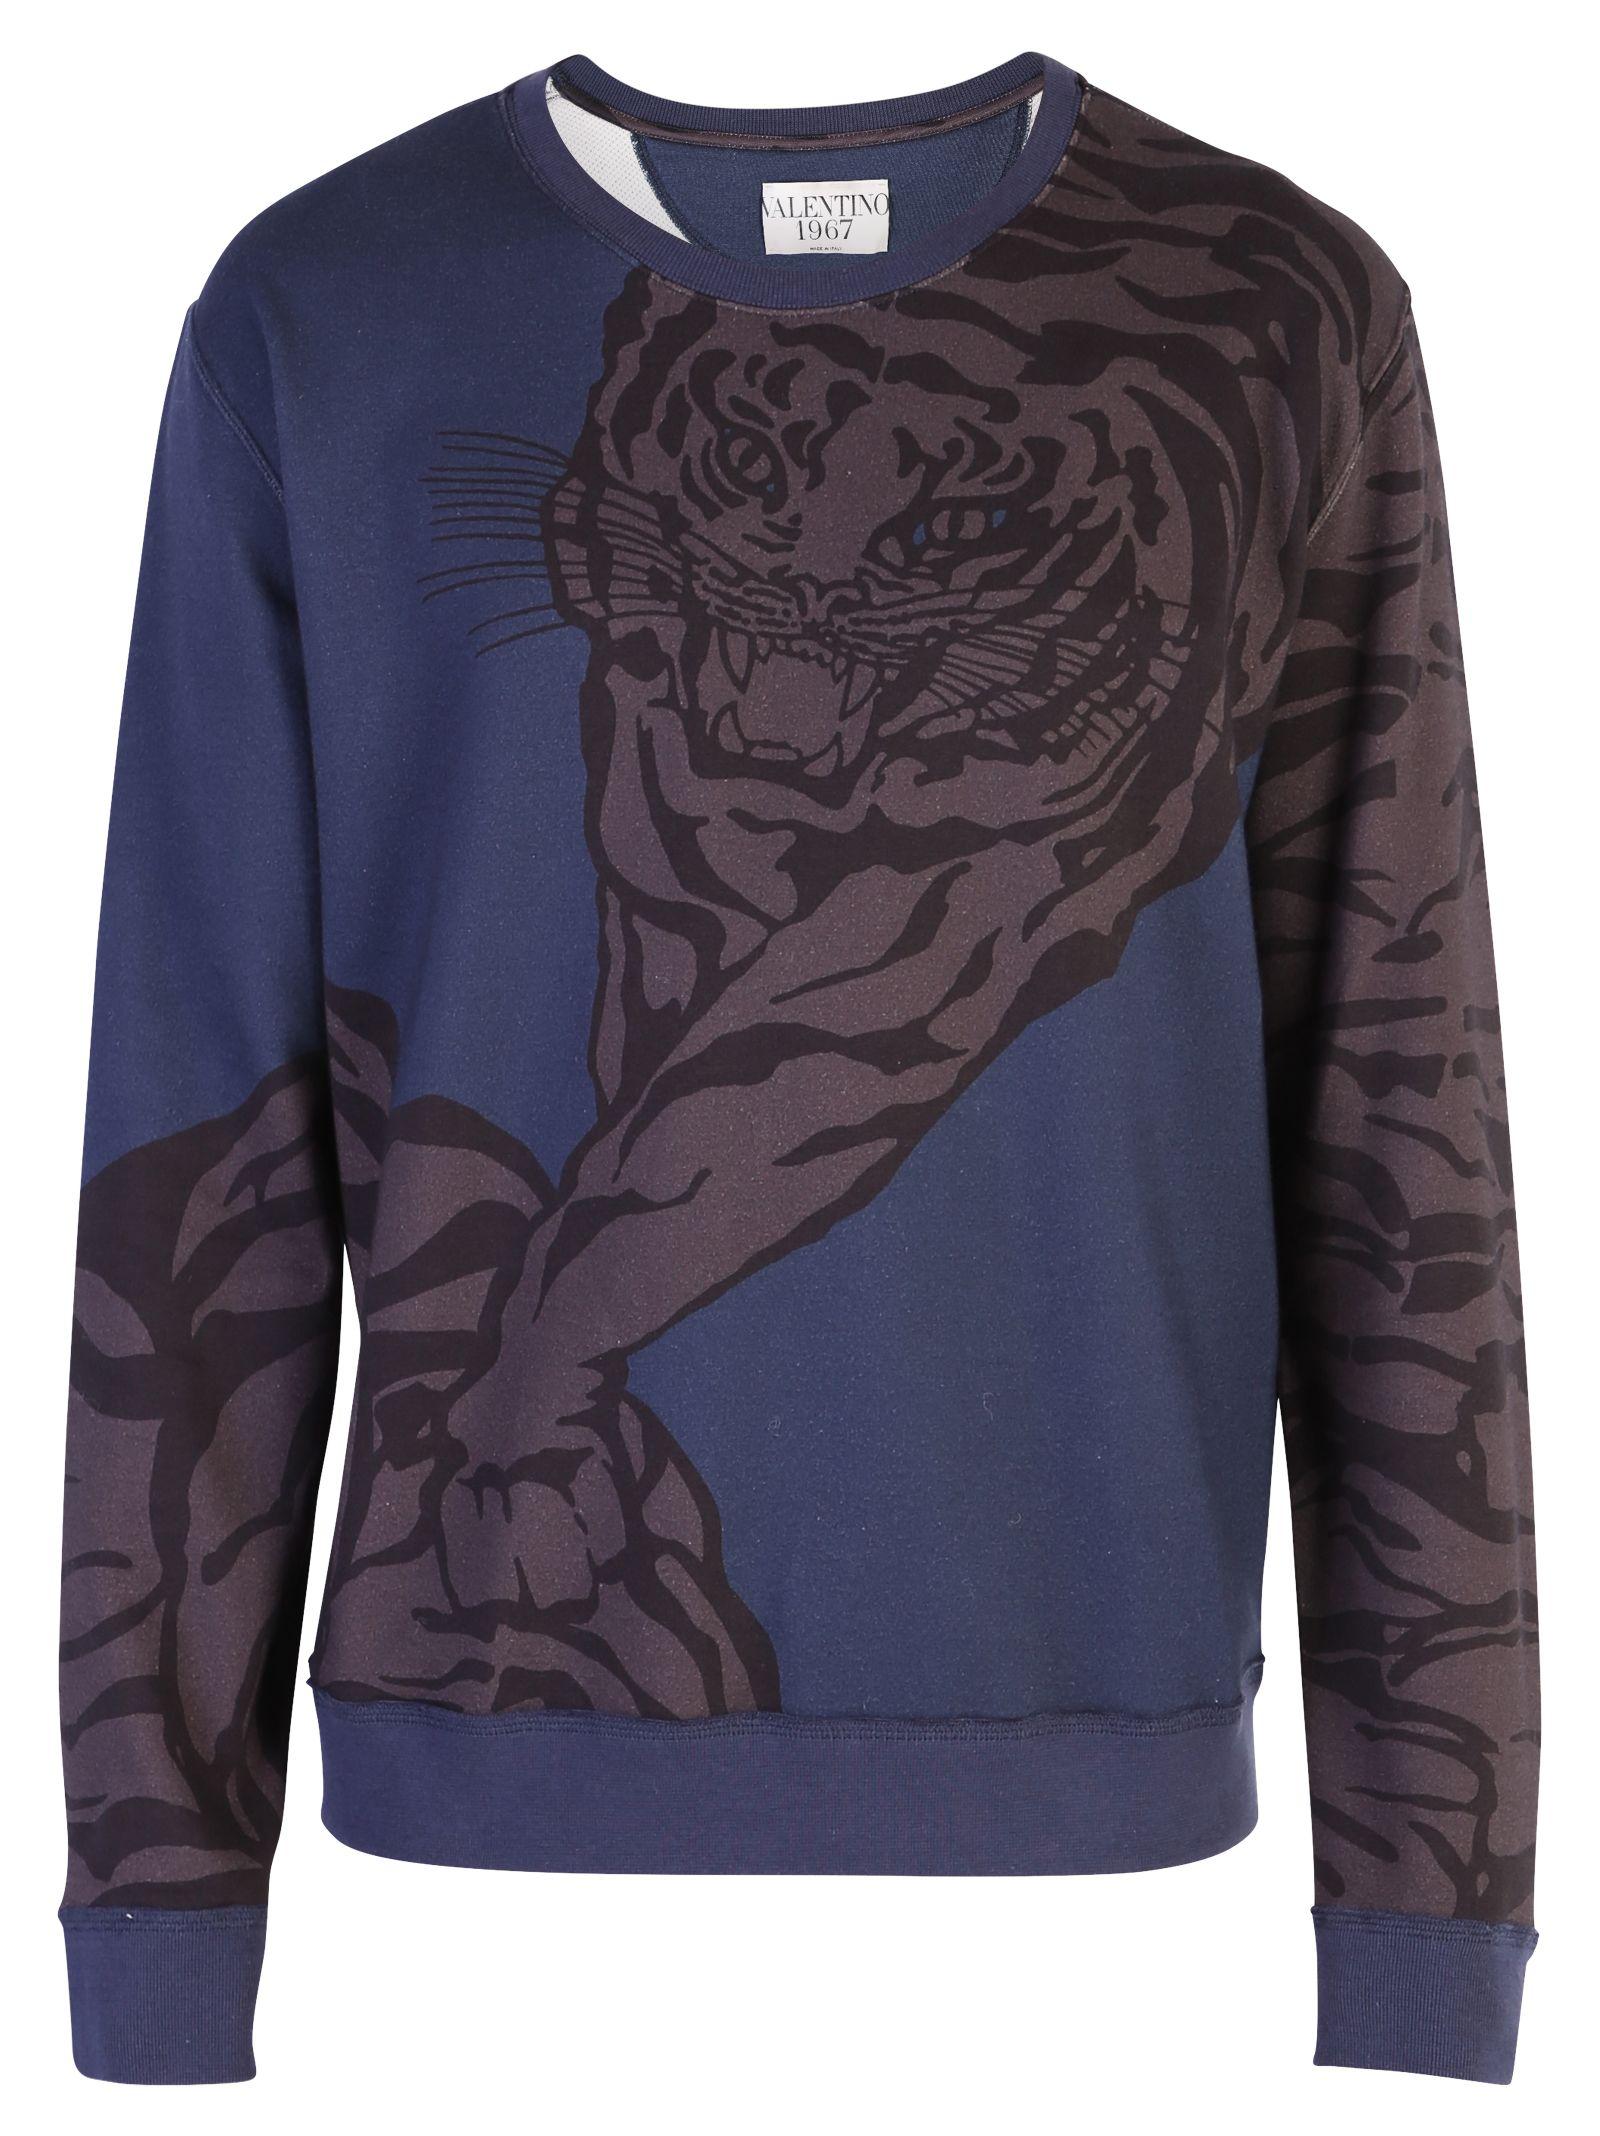 eaf897acc3 Valentino Blue Tiger Print Sweatshirt - Blue ...